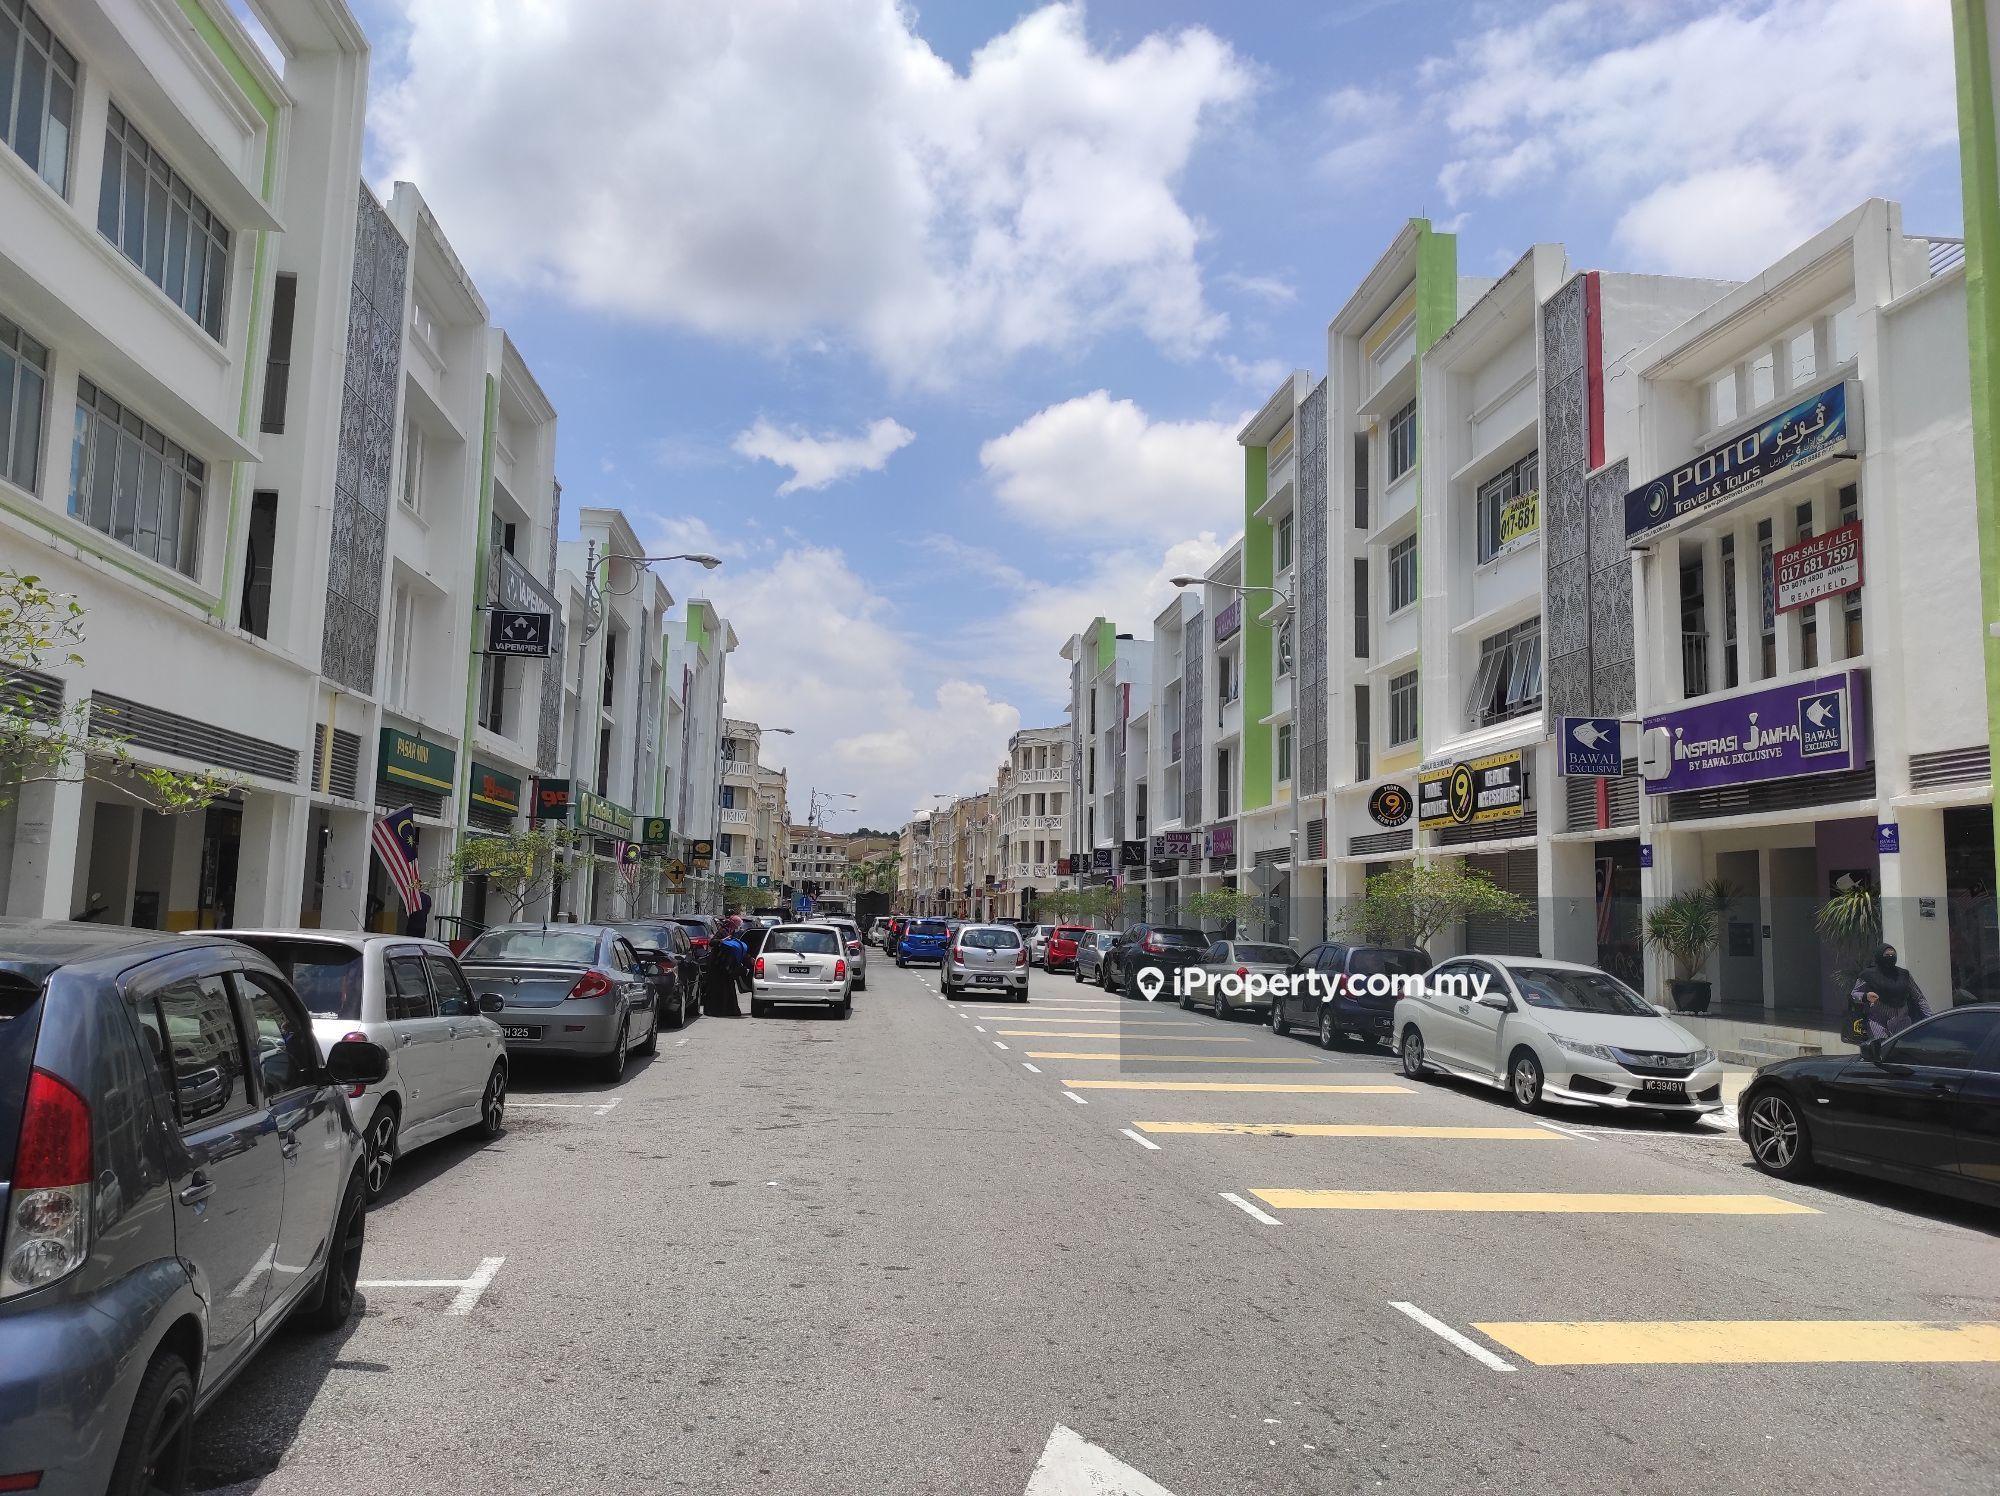 Diplomatic Enclave Presint 15, Presint 15, Putrajaya